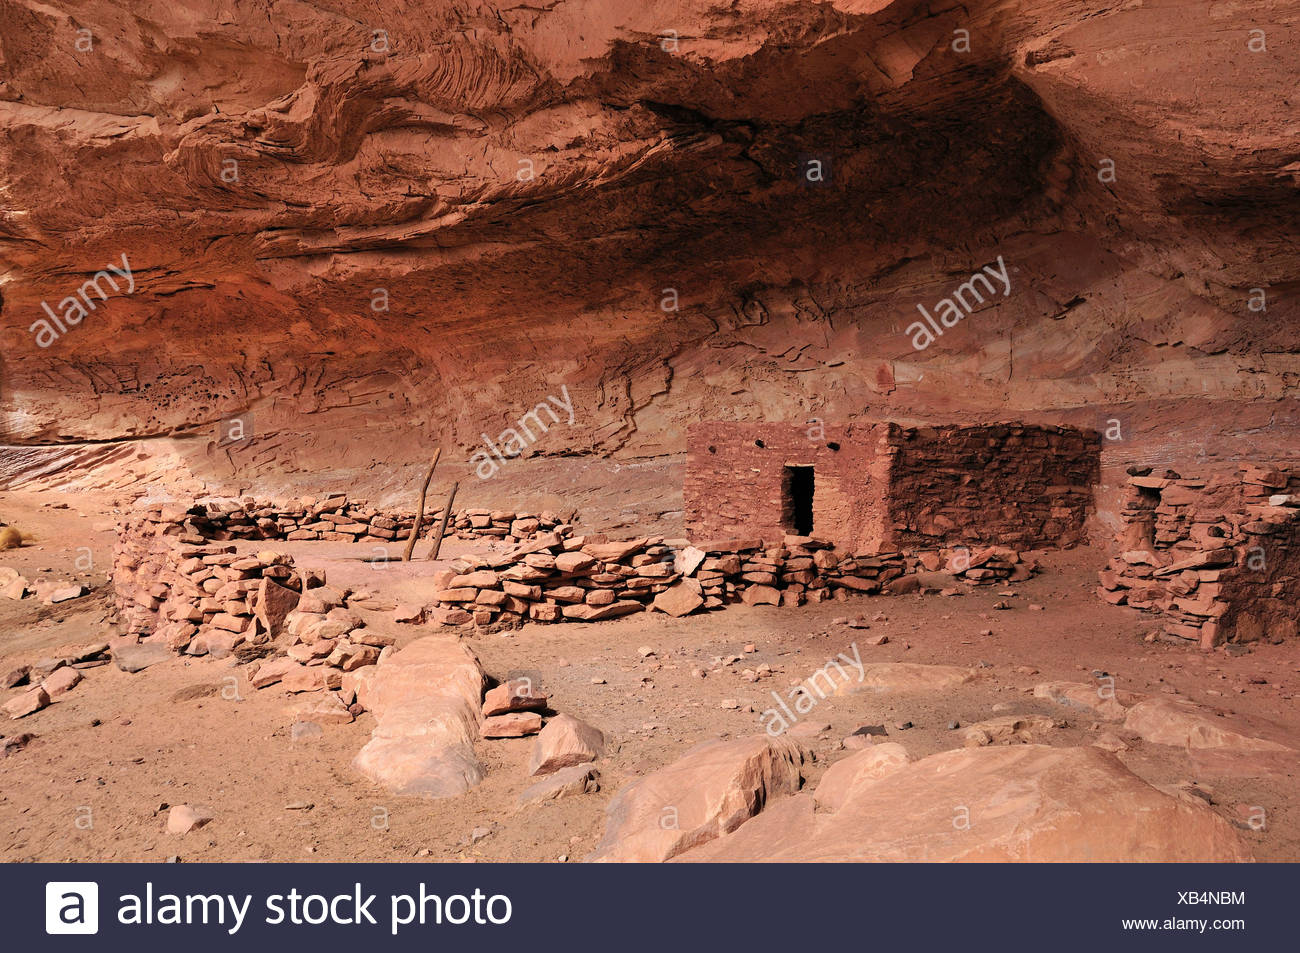 Anasazi, Cliff Dwellings, perfekte Kiva, ruinieren, Bullet Canyon, Grand Gulch primitiven Bereich, Cedar Mesa, Colorado Plateau, Utah, USA Stockbild